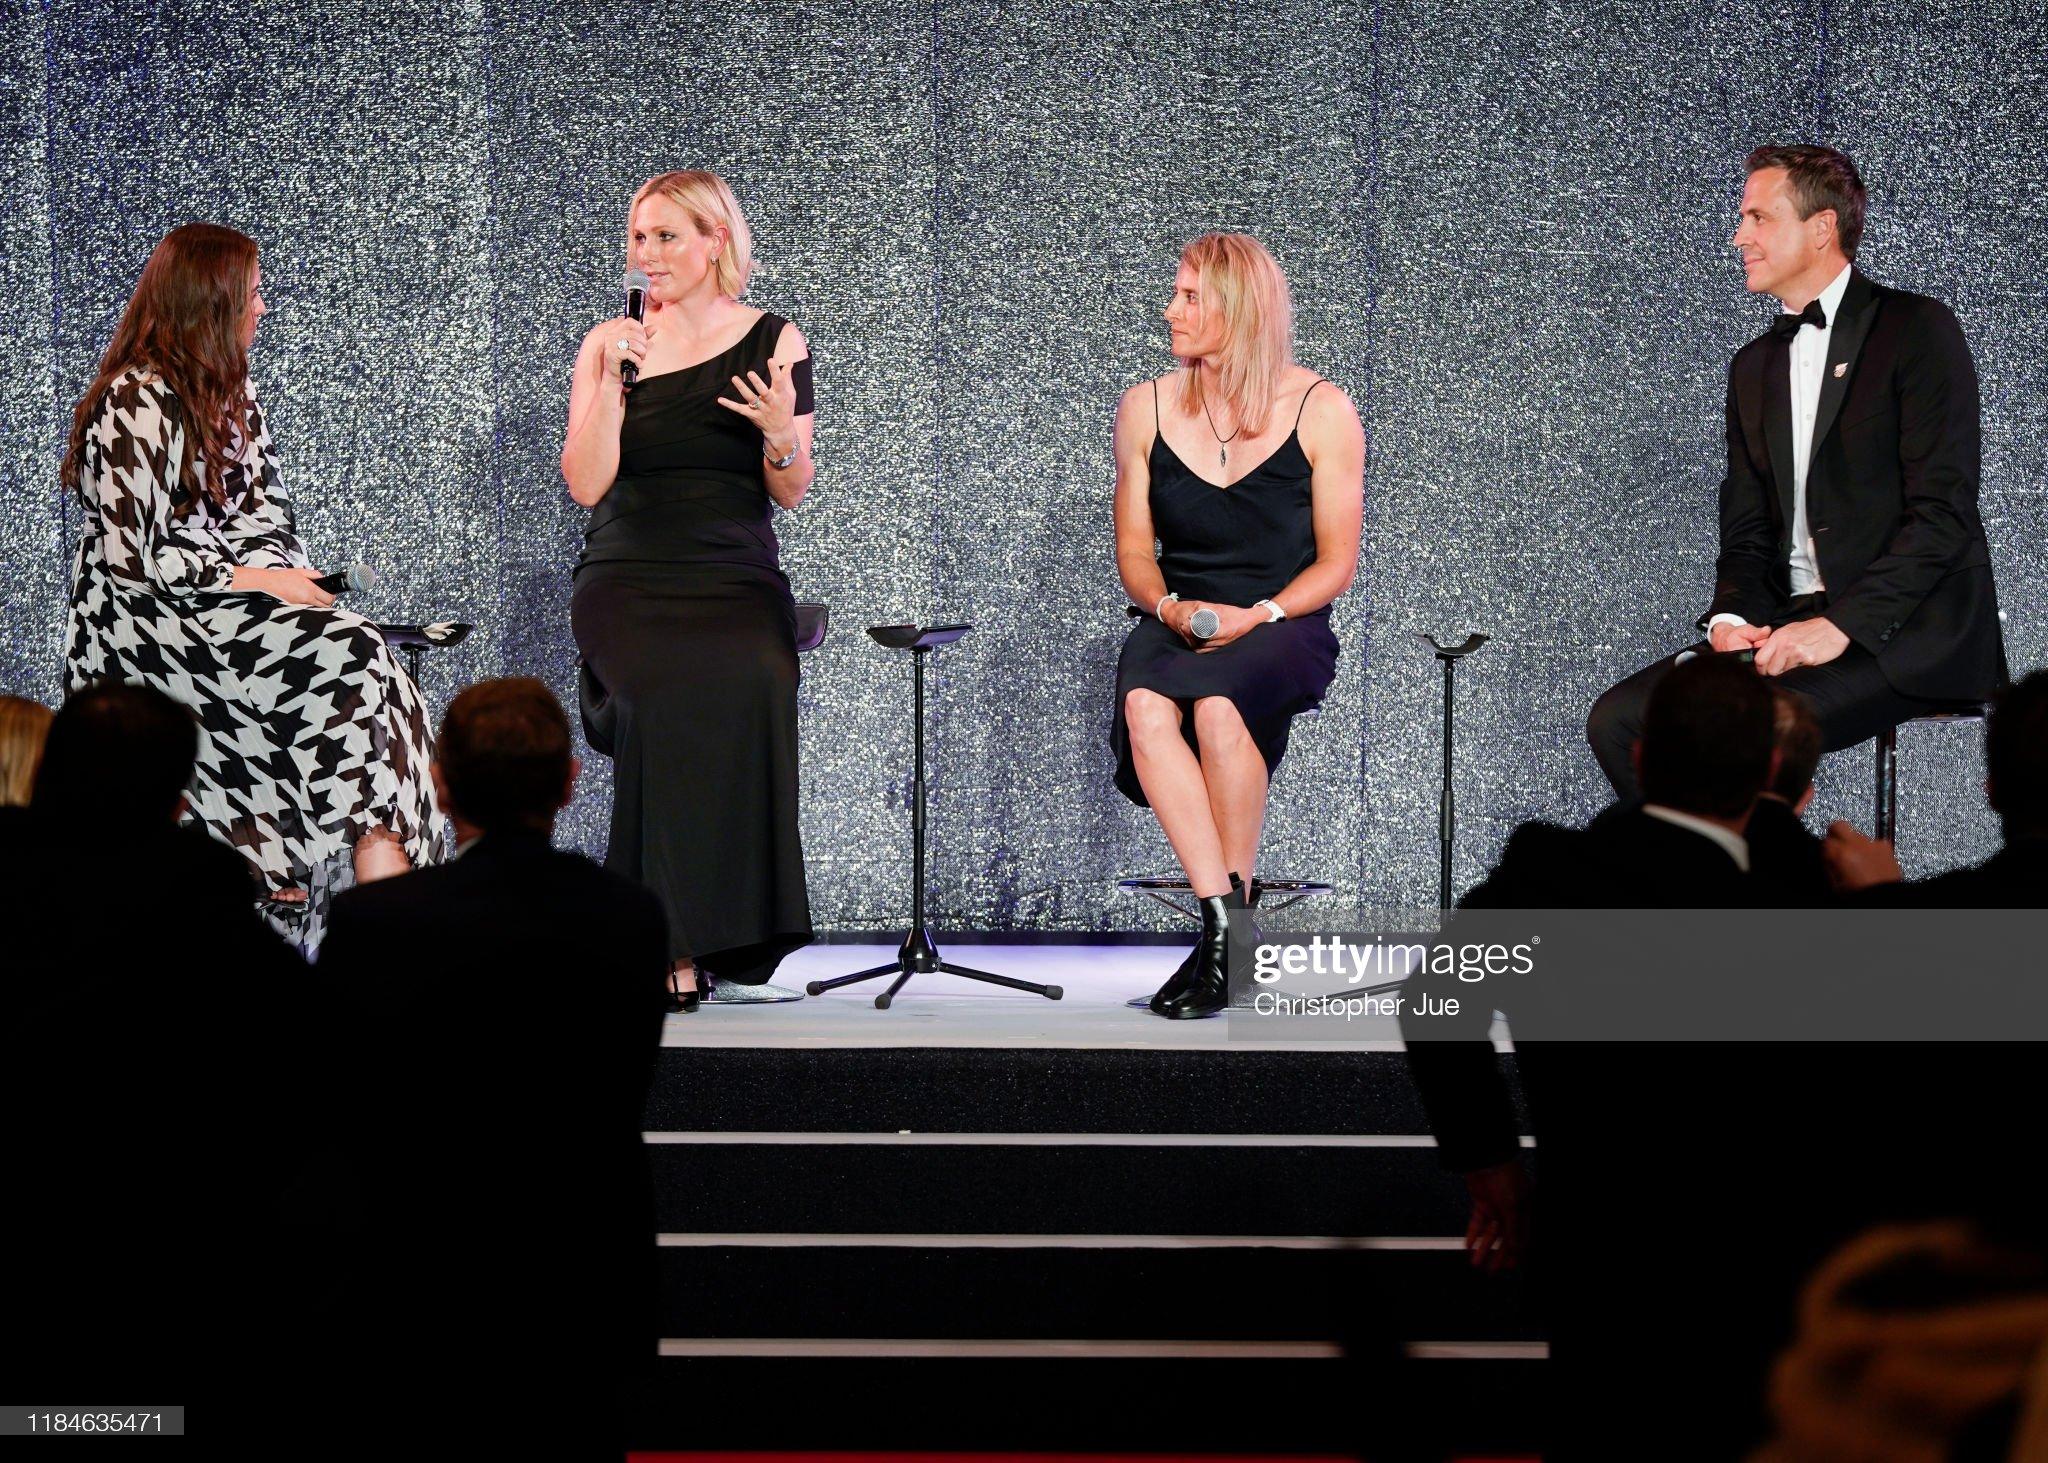 New Zealand Olympics Committee Gala Dinner : News Photo